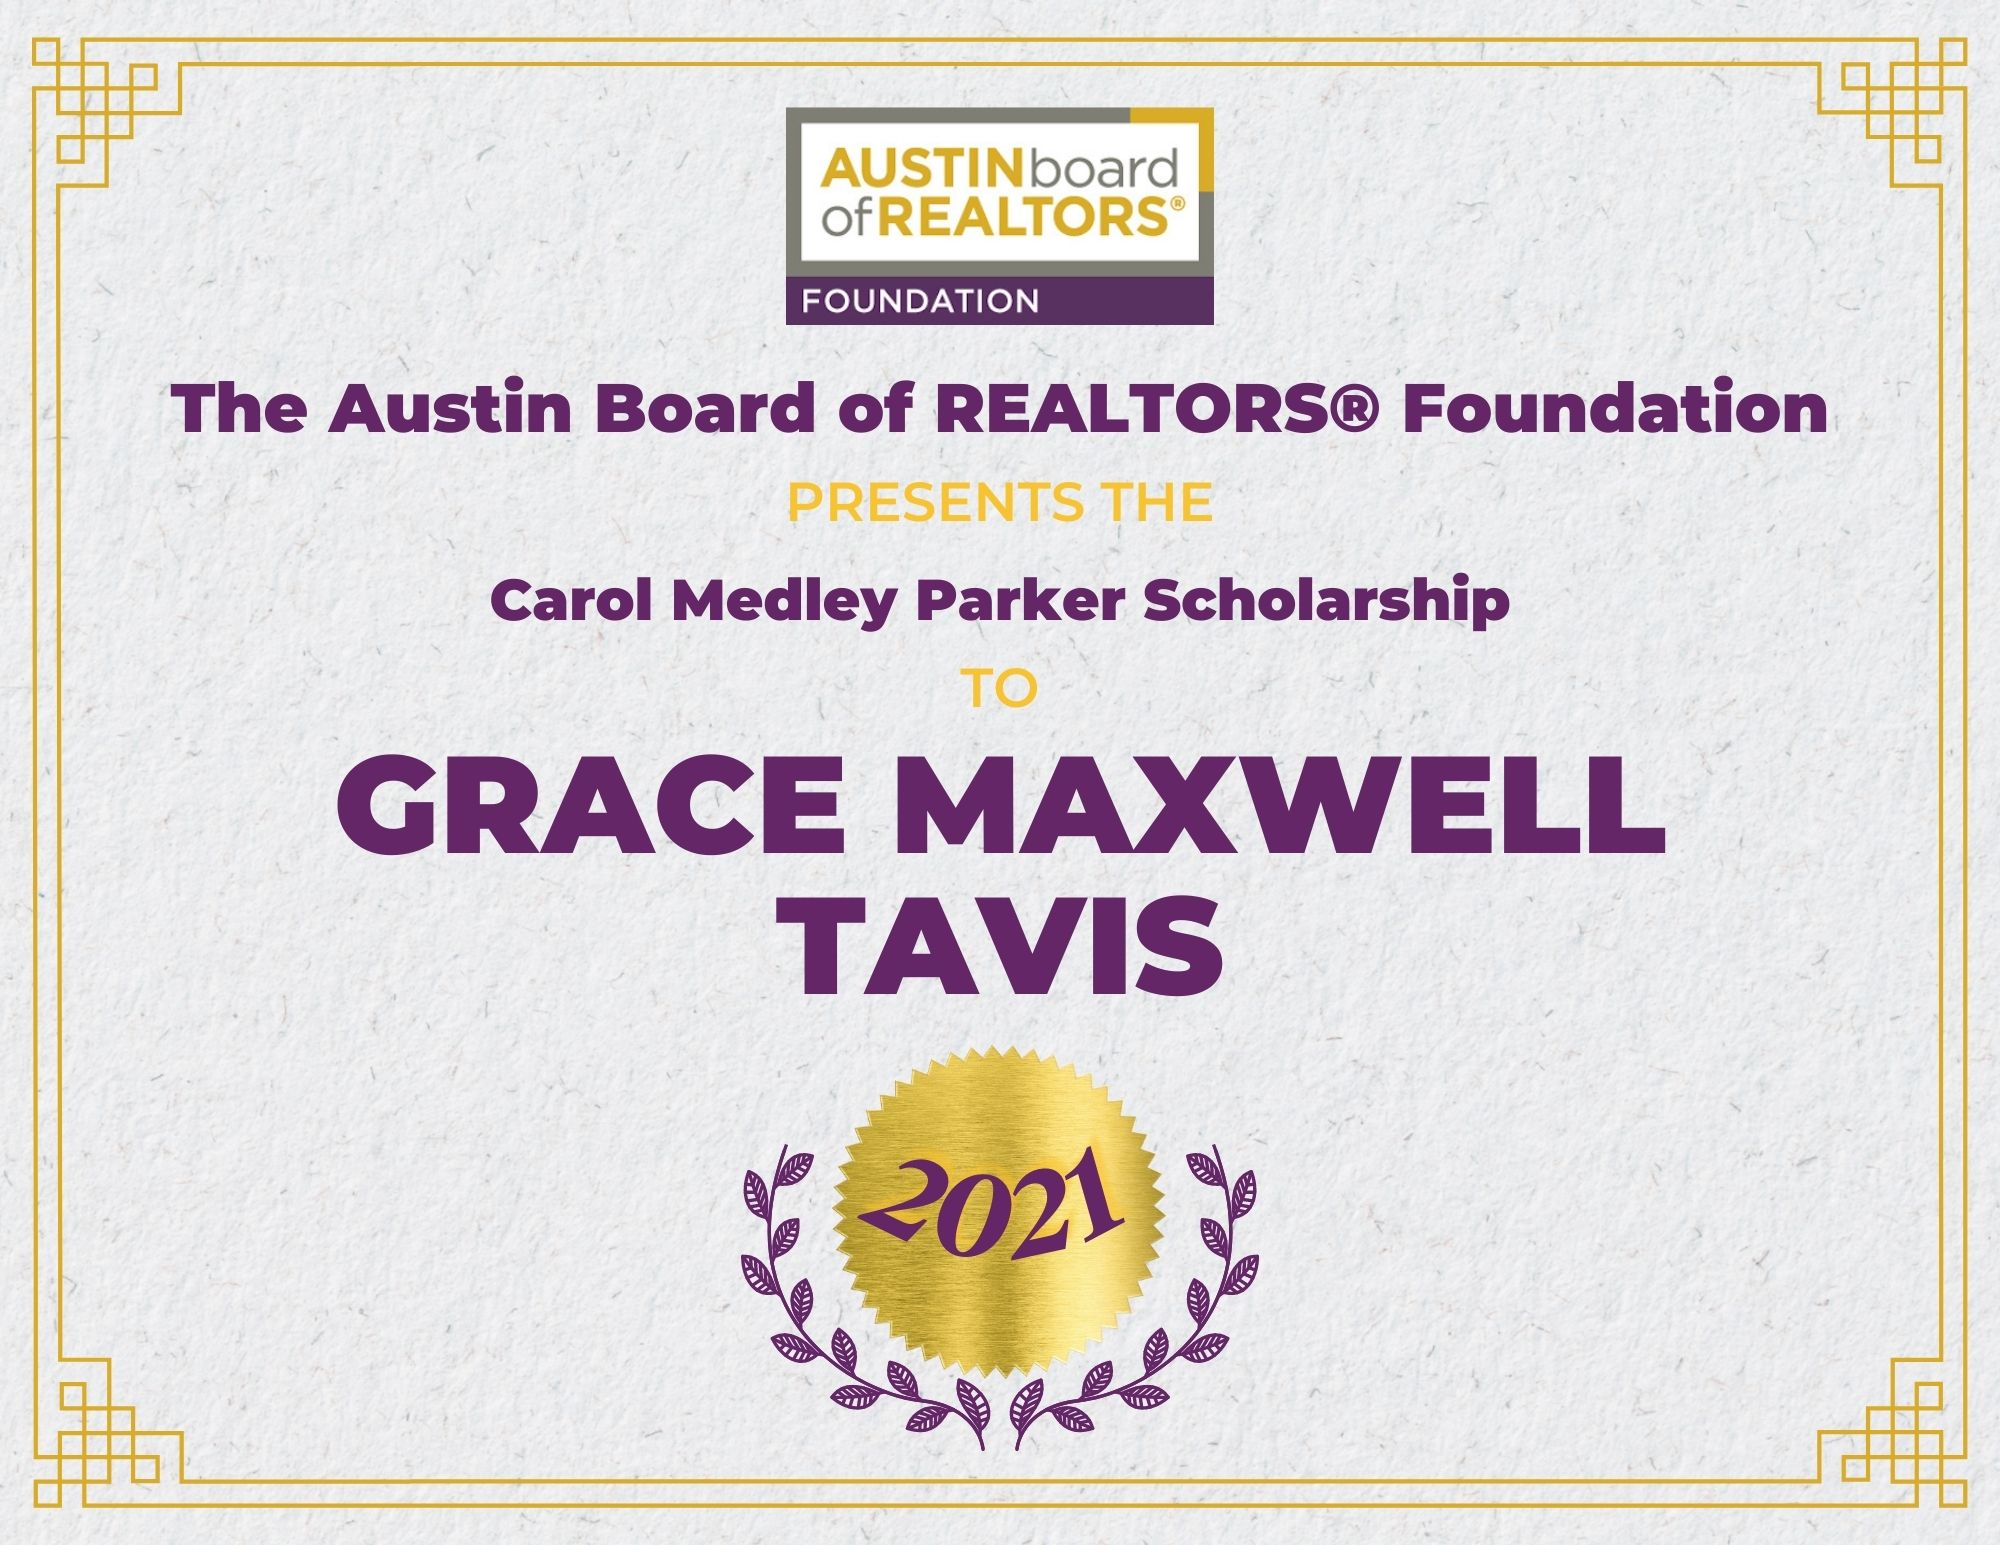 2021 Fou Scholarship Certificate_Gracemaxwelltavis